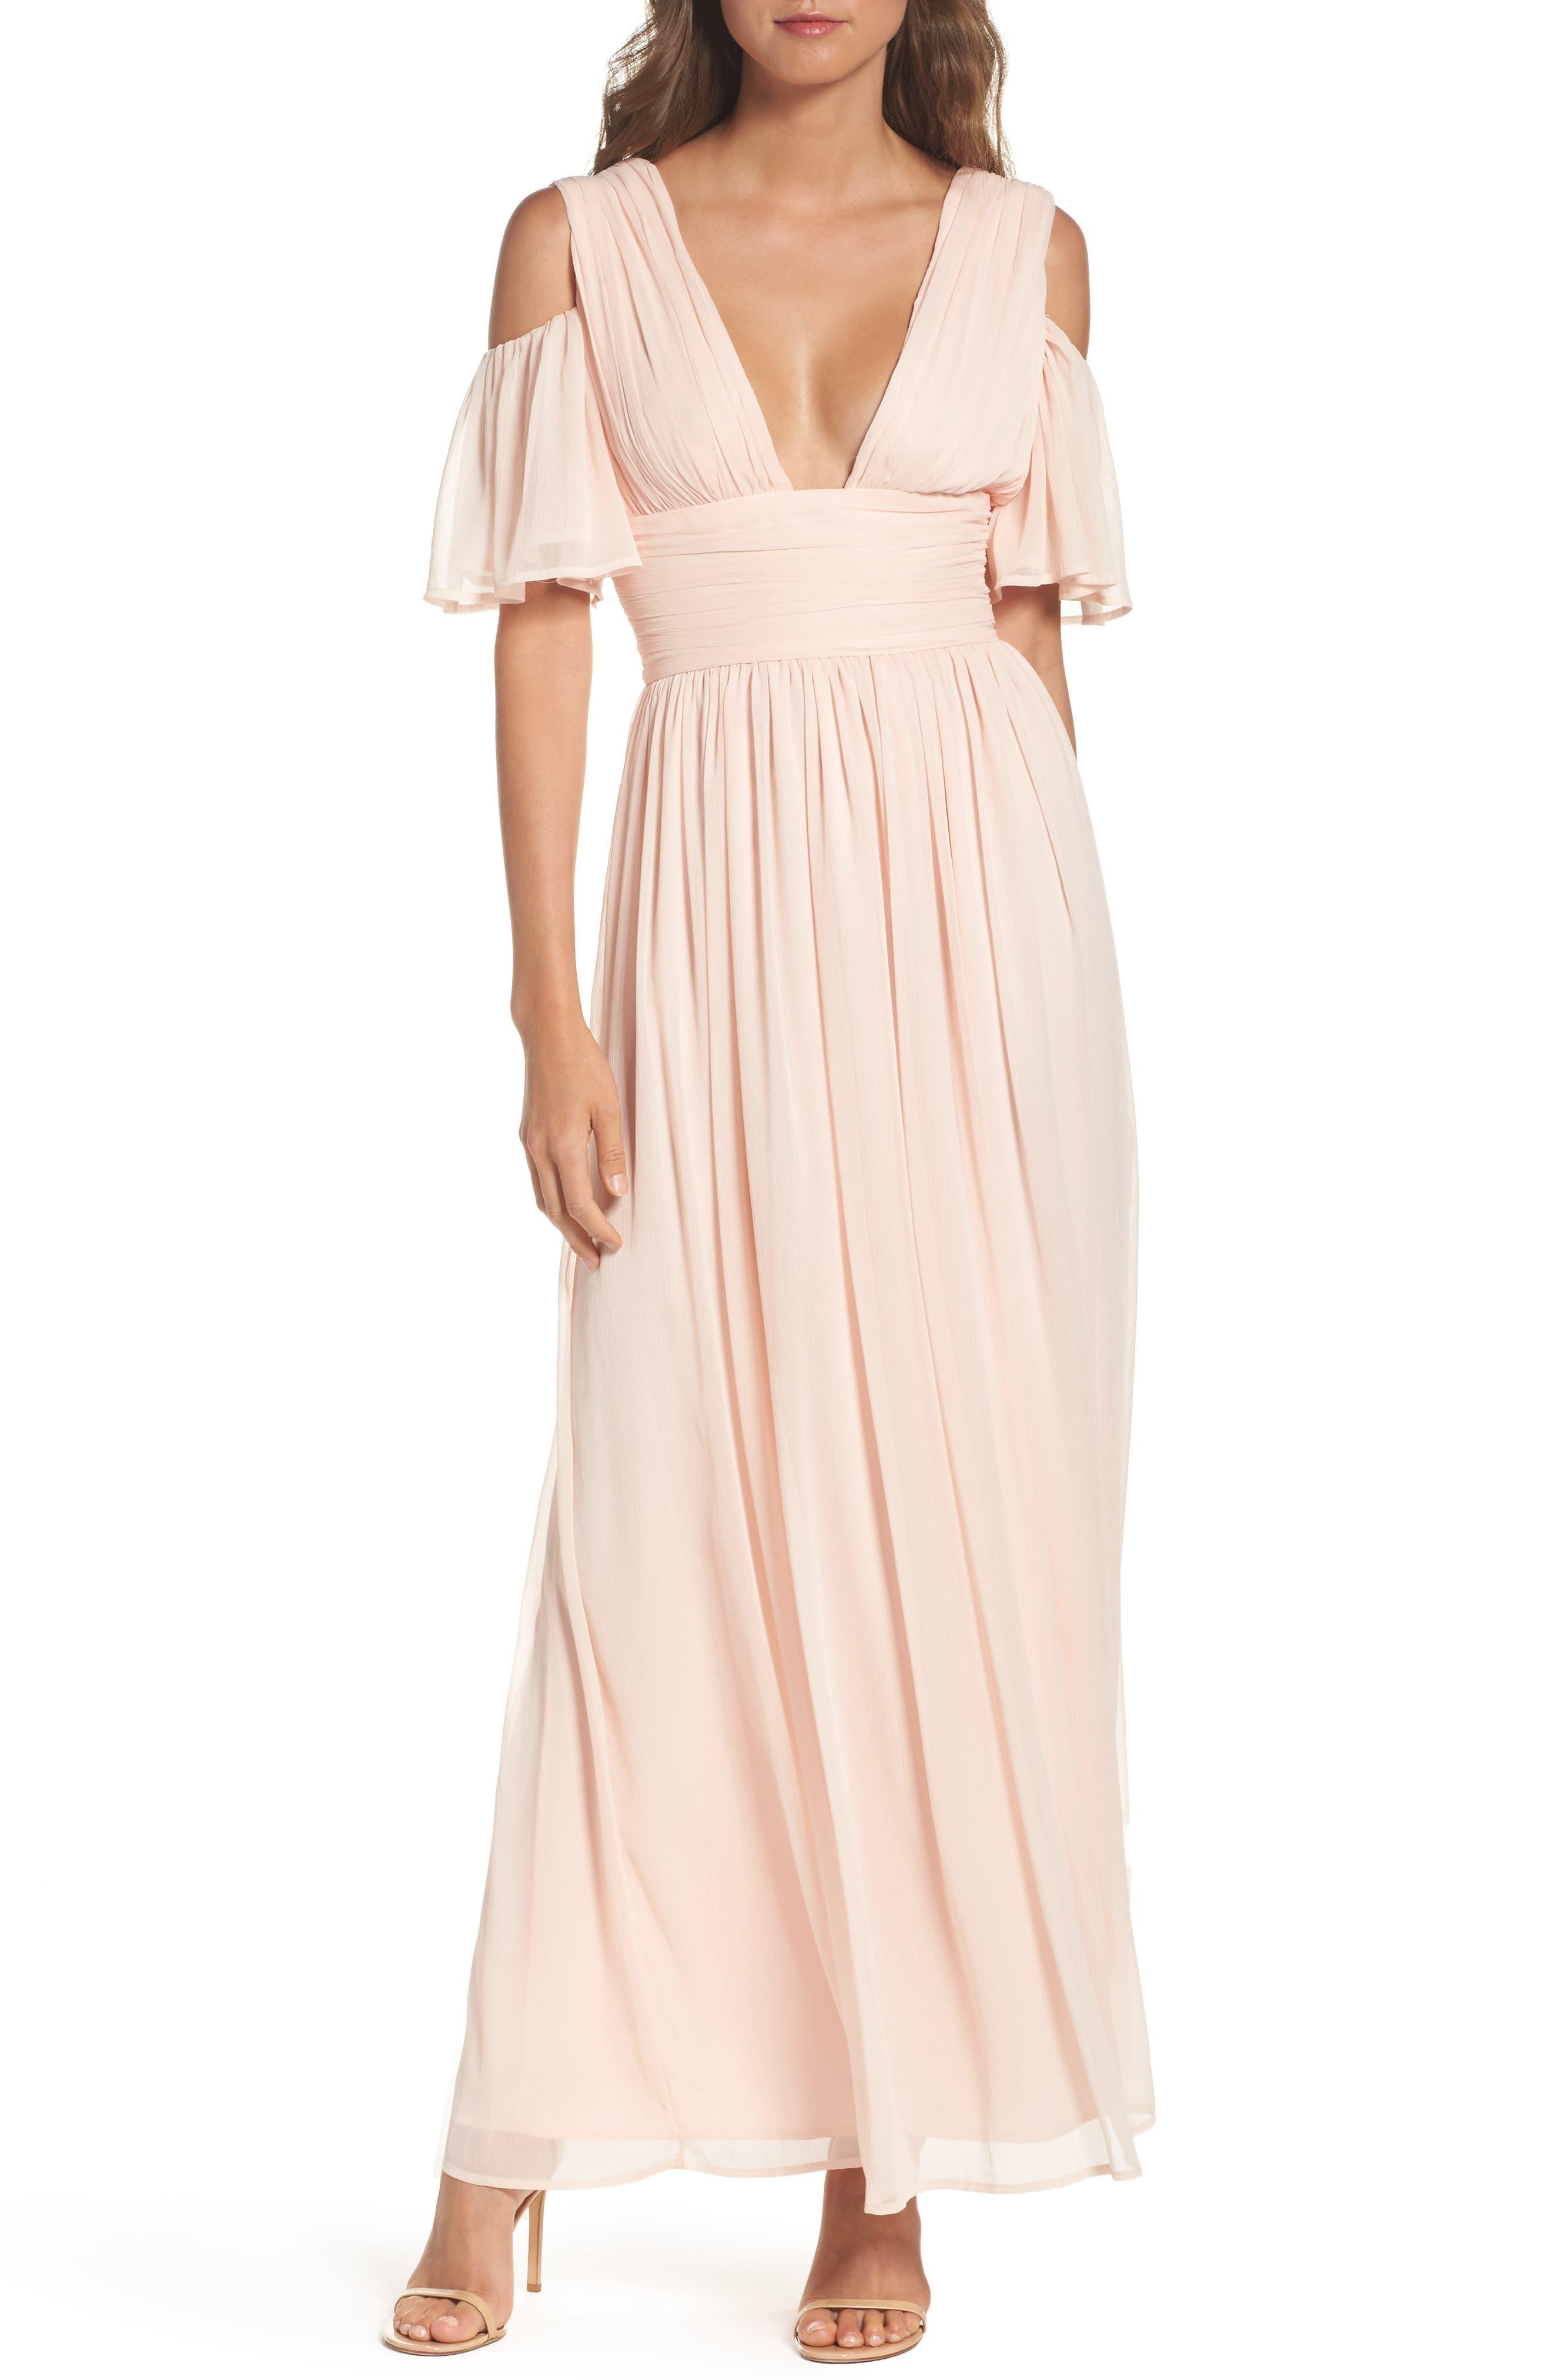 Constance Cold Shoulder Maxi Dress,                             Main thumbnail 1, color,                             680